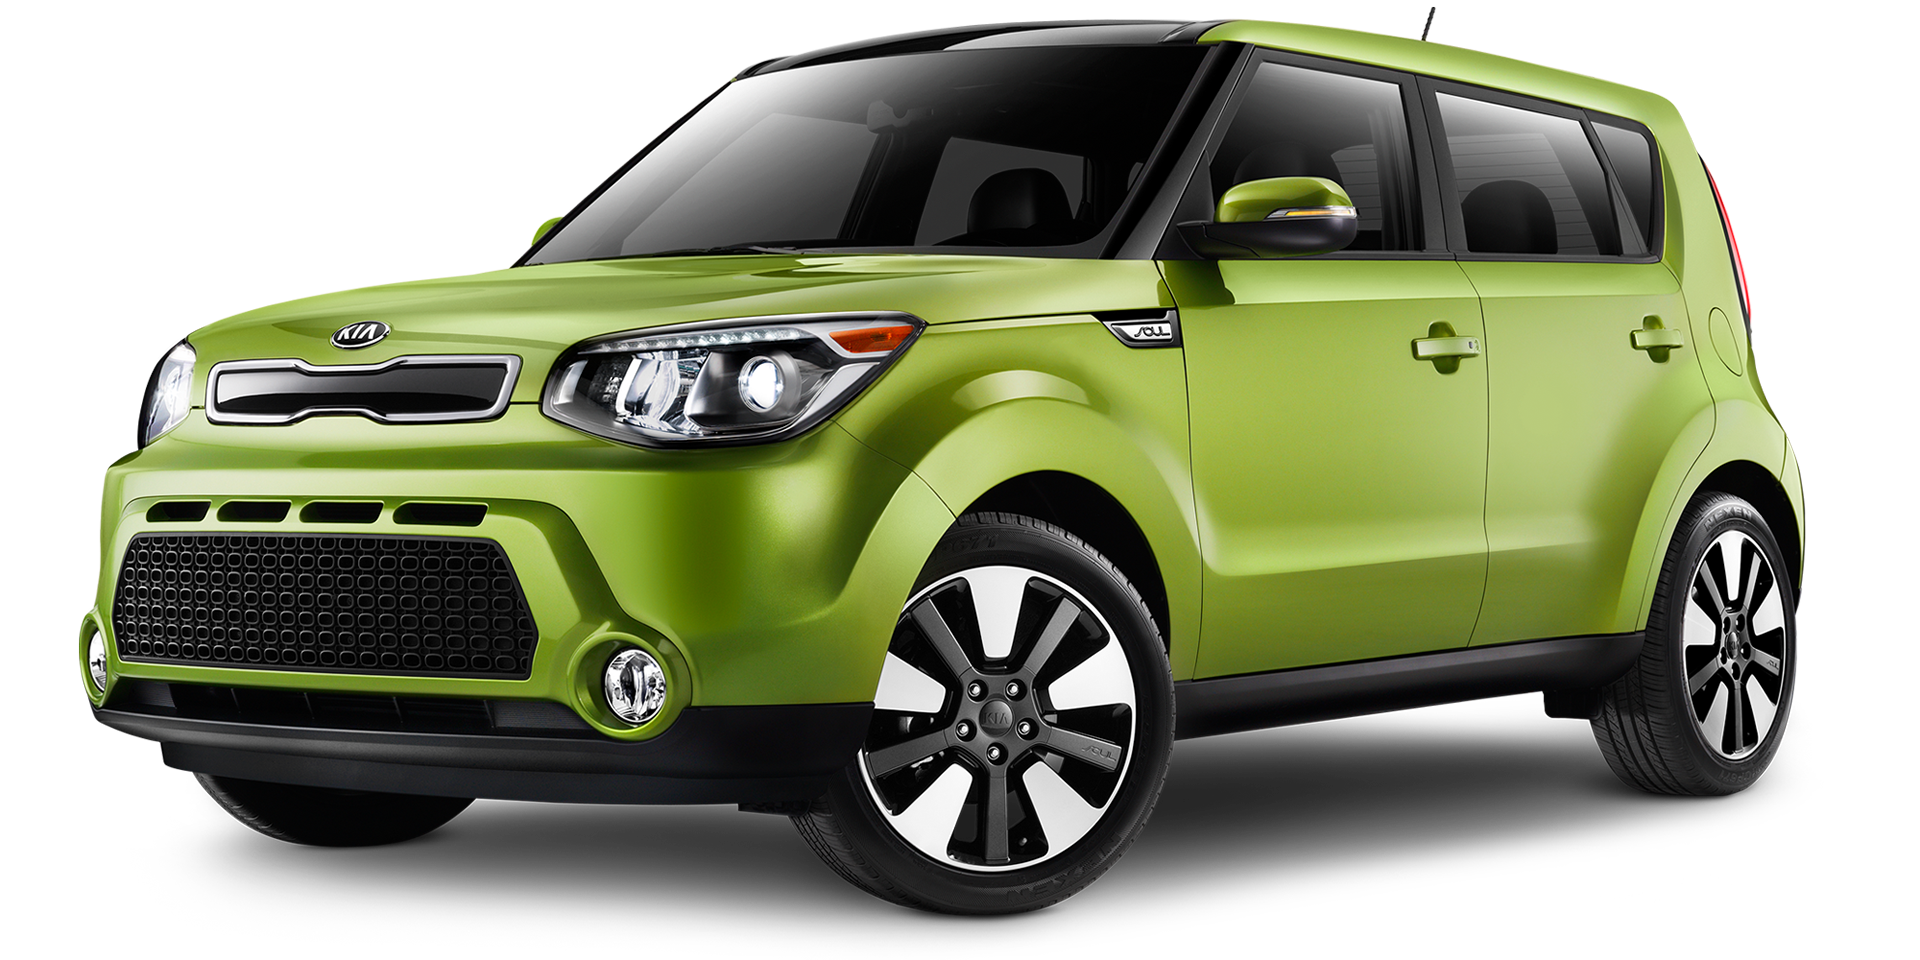 Kia Soul Gas Mileage >> The 2015 Kia Soul Alian Green With The Lowest Gas Mileage